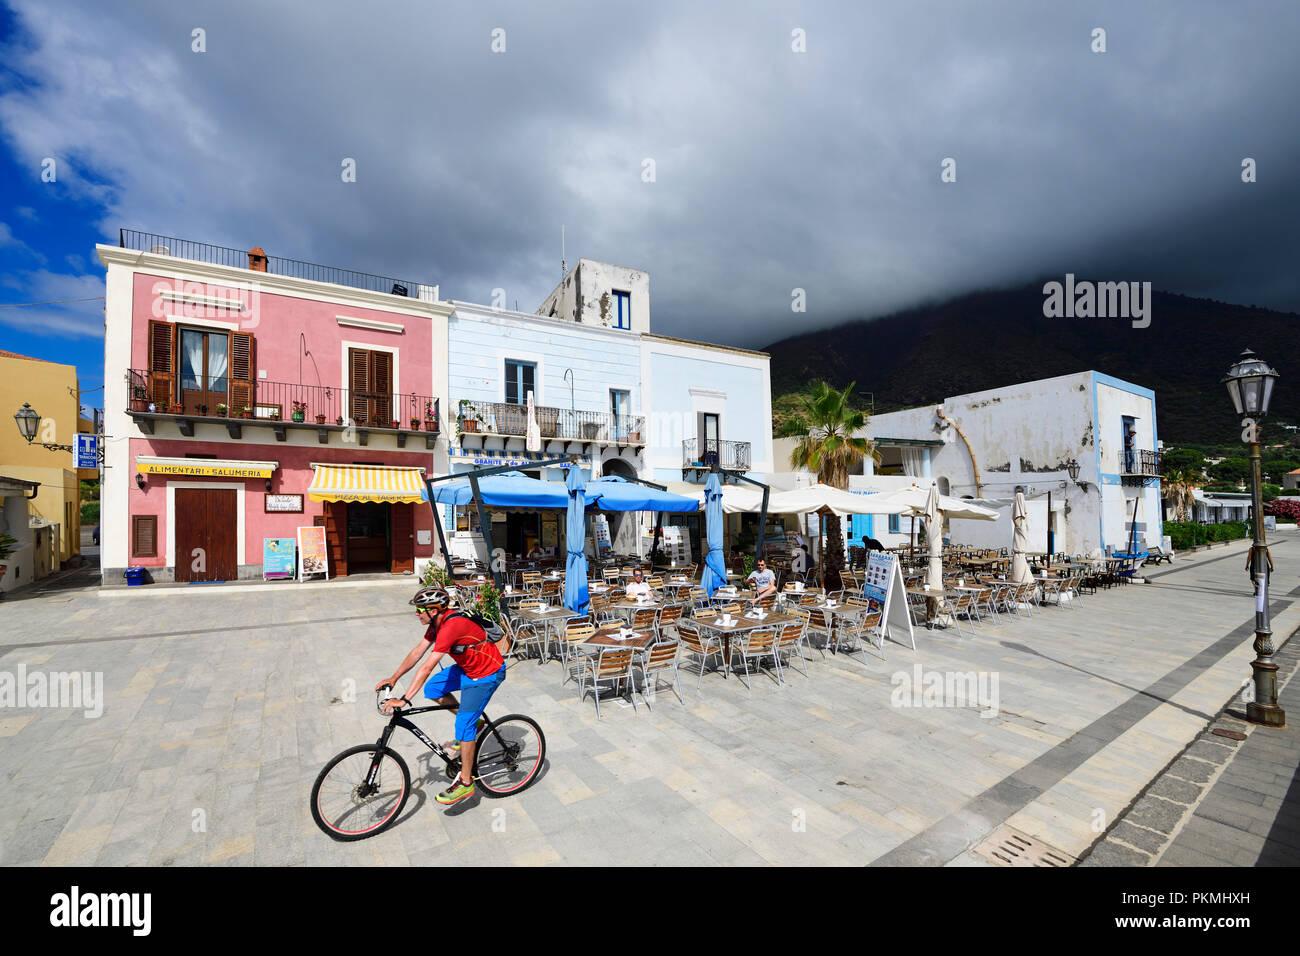 Cyclist in front of Ristorane da Alfredo in Lingua, Salina Island, Lipari or Aeolian Islands, Sicily, Italy - Stock Image